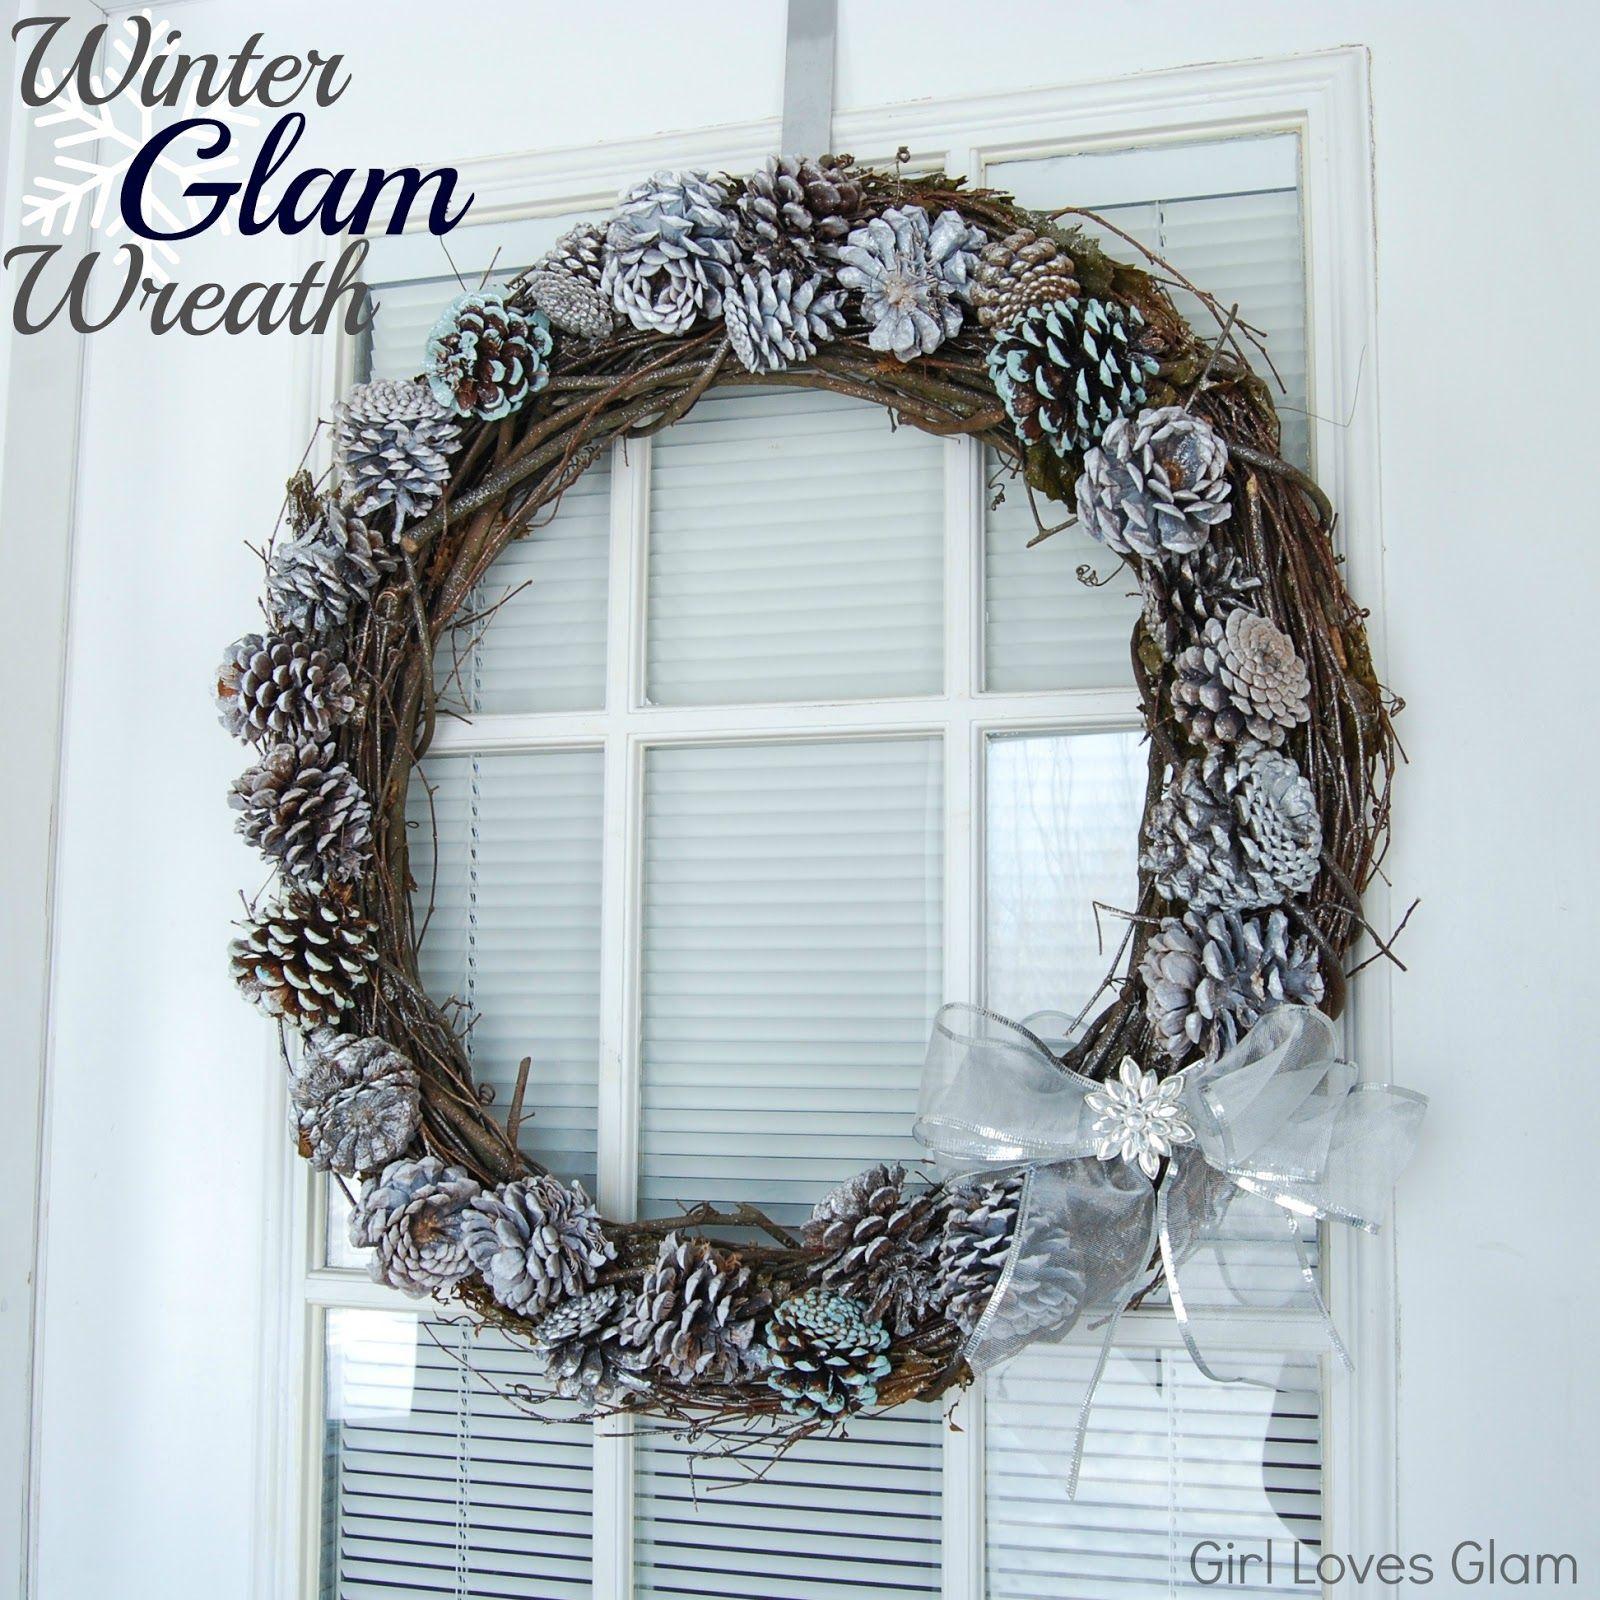 Winter Glam Pine Cone Wreath Tutorial #winter #diy #decor